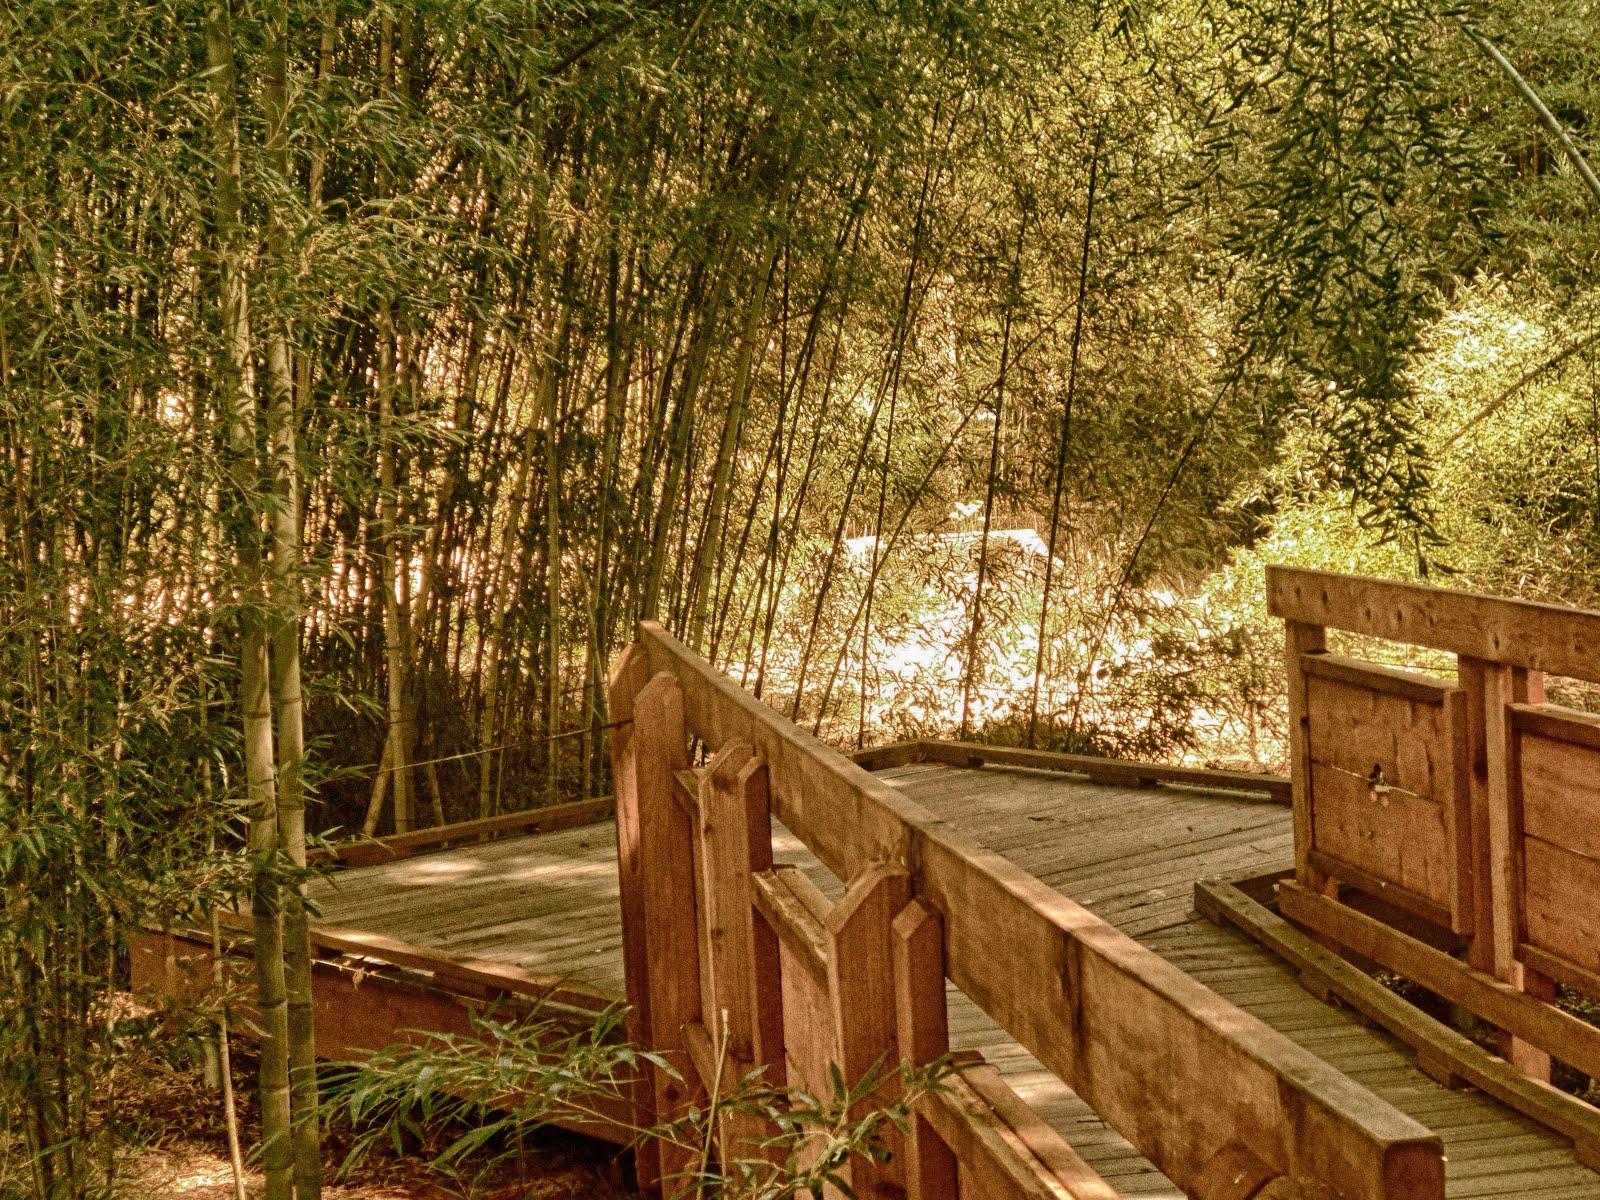 HHS Digital Photo Blog: Sophia J- Under the Bamboo Trees